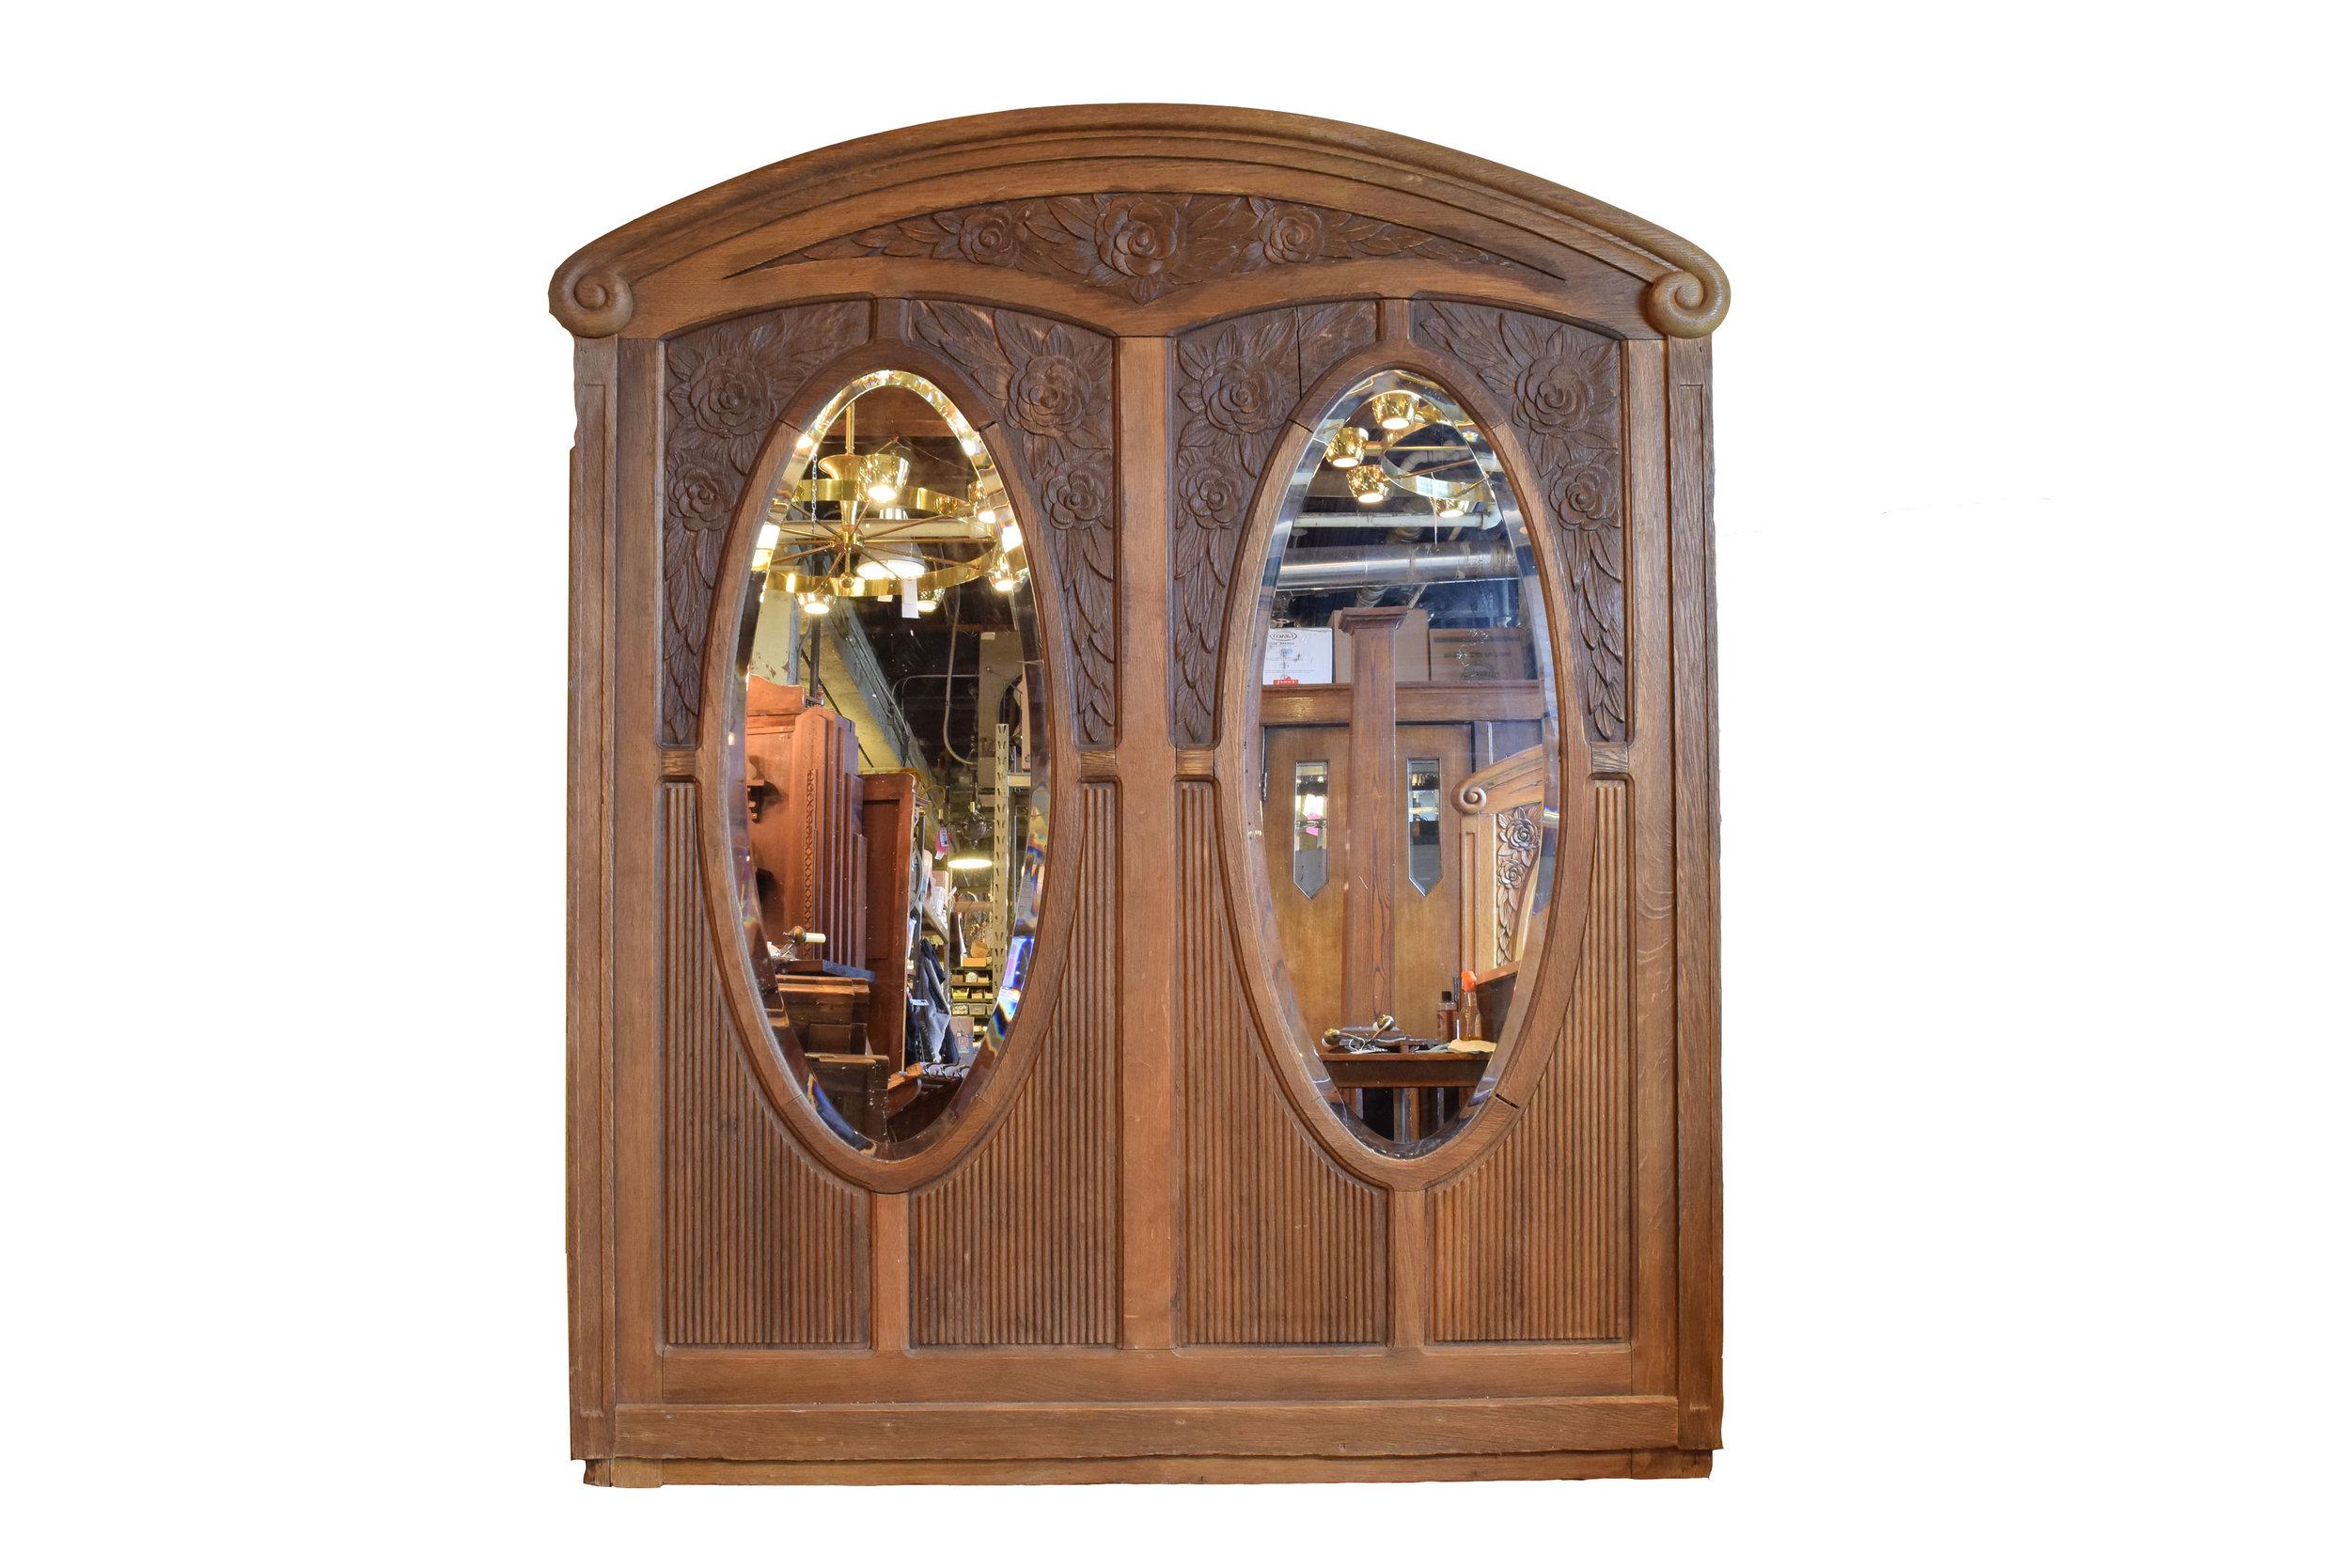 46992-oak-frame-with-oval-mirrors-main.jpg